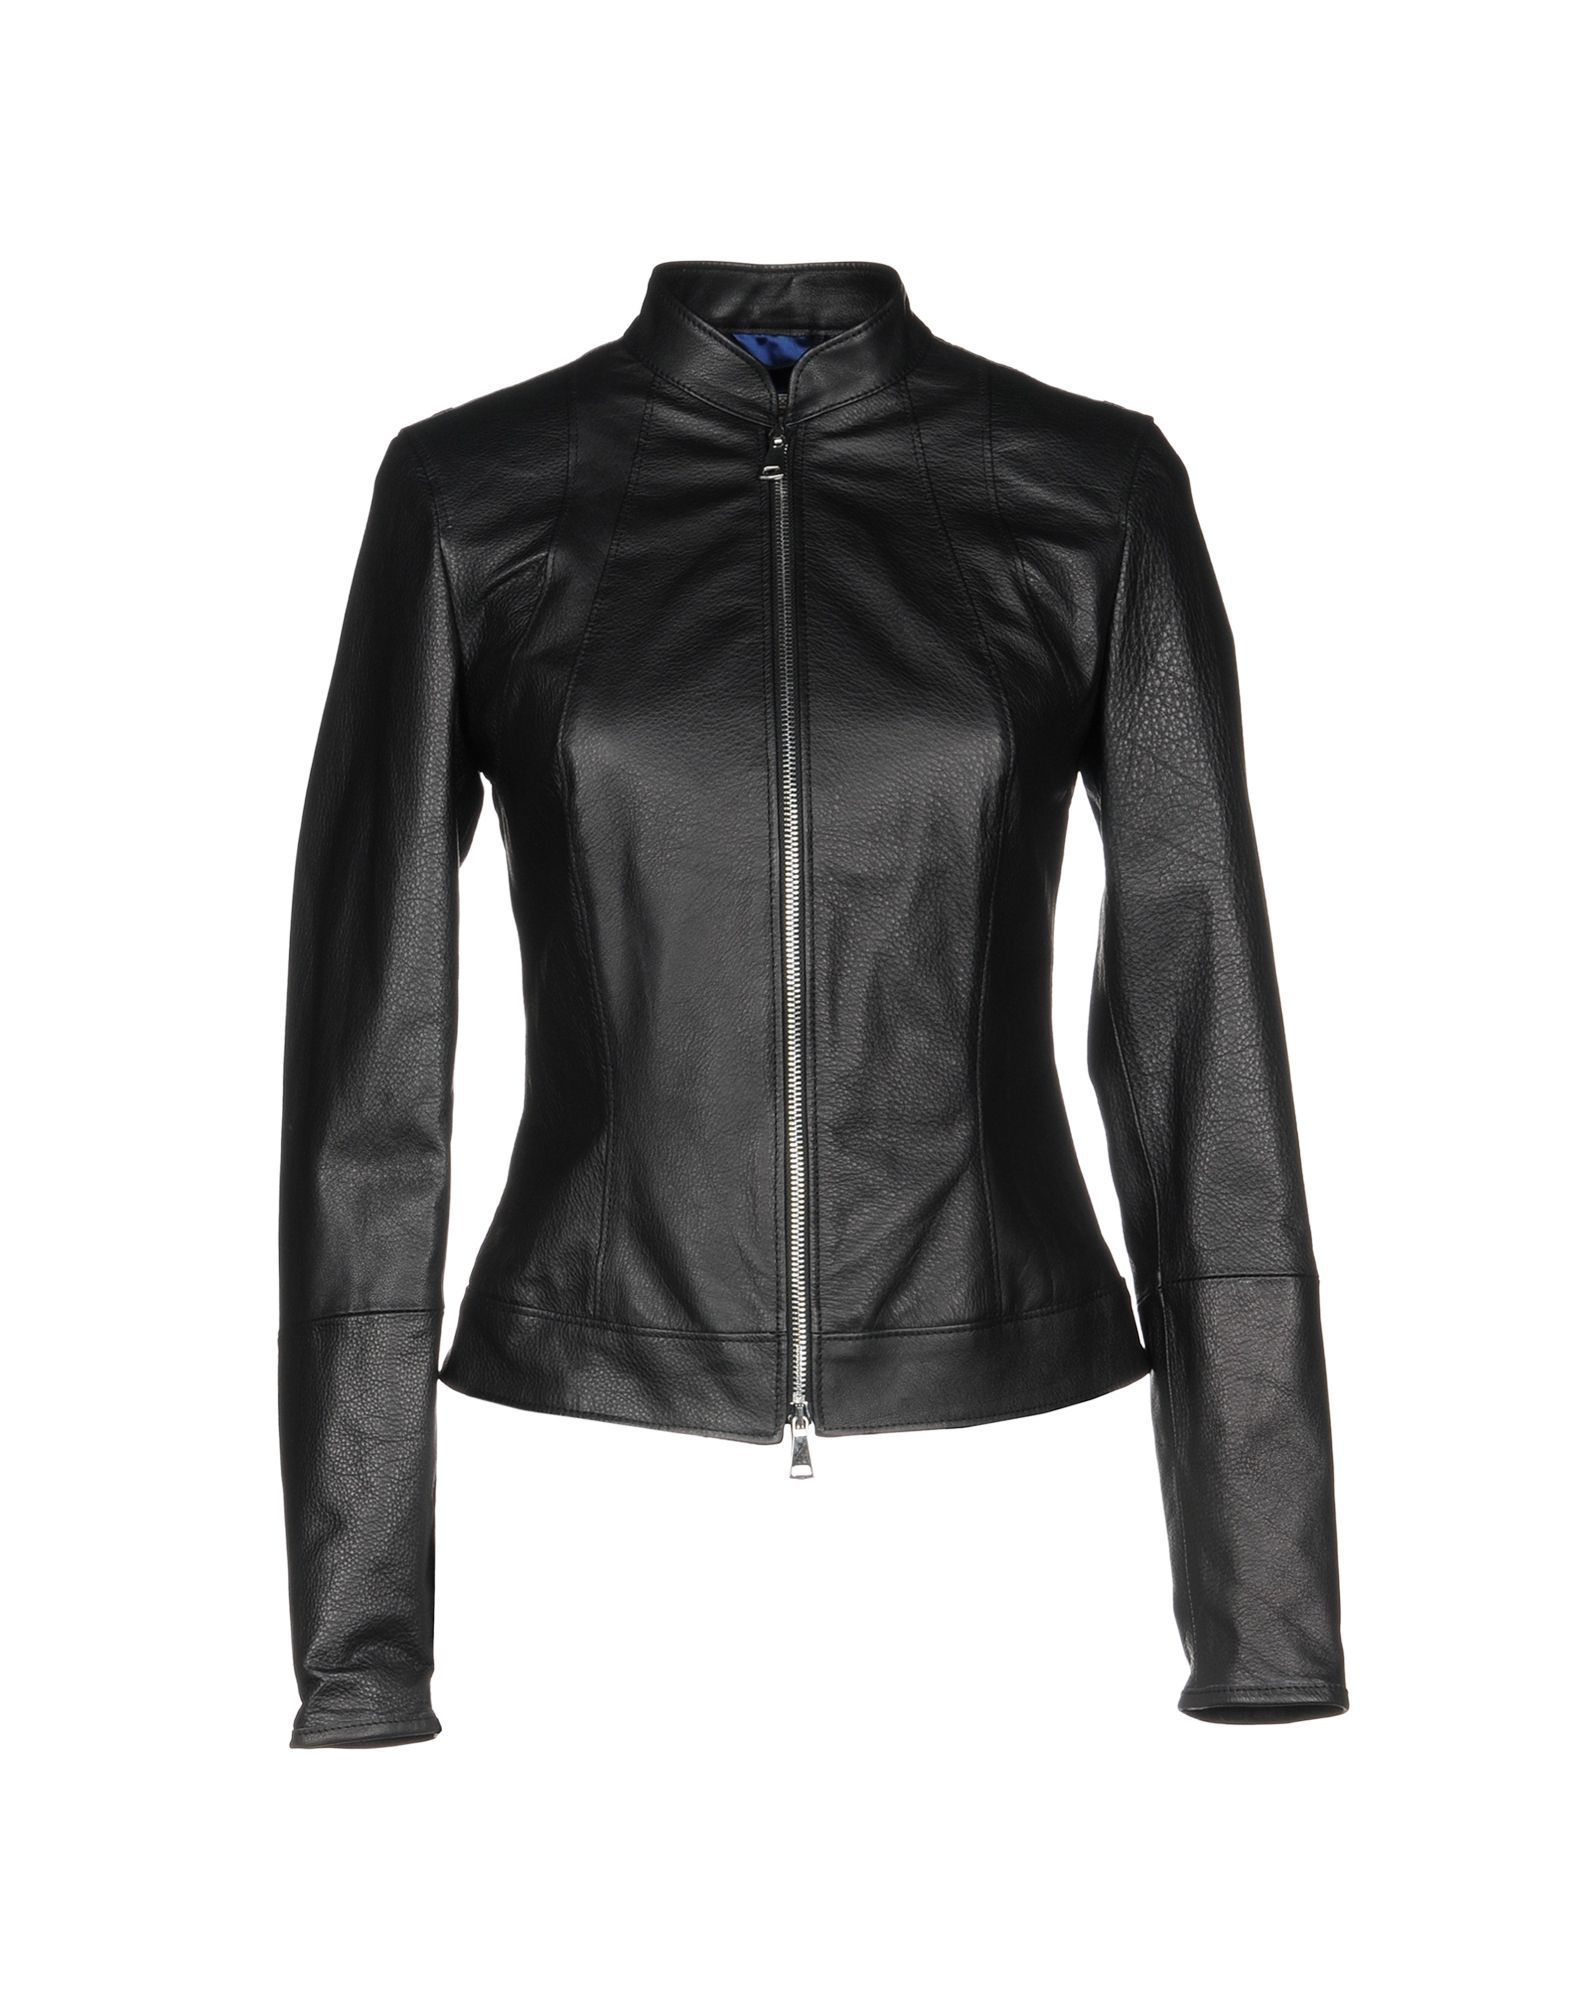 Coat & Jackets Vintage De Luxe Black Women's Leather